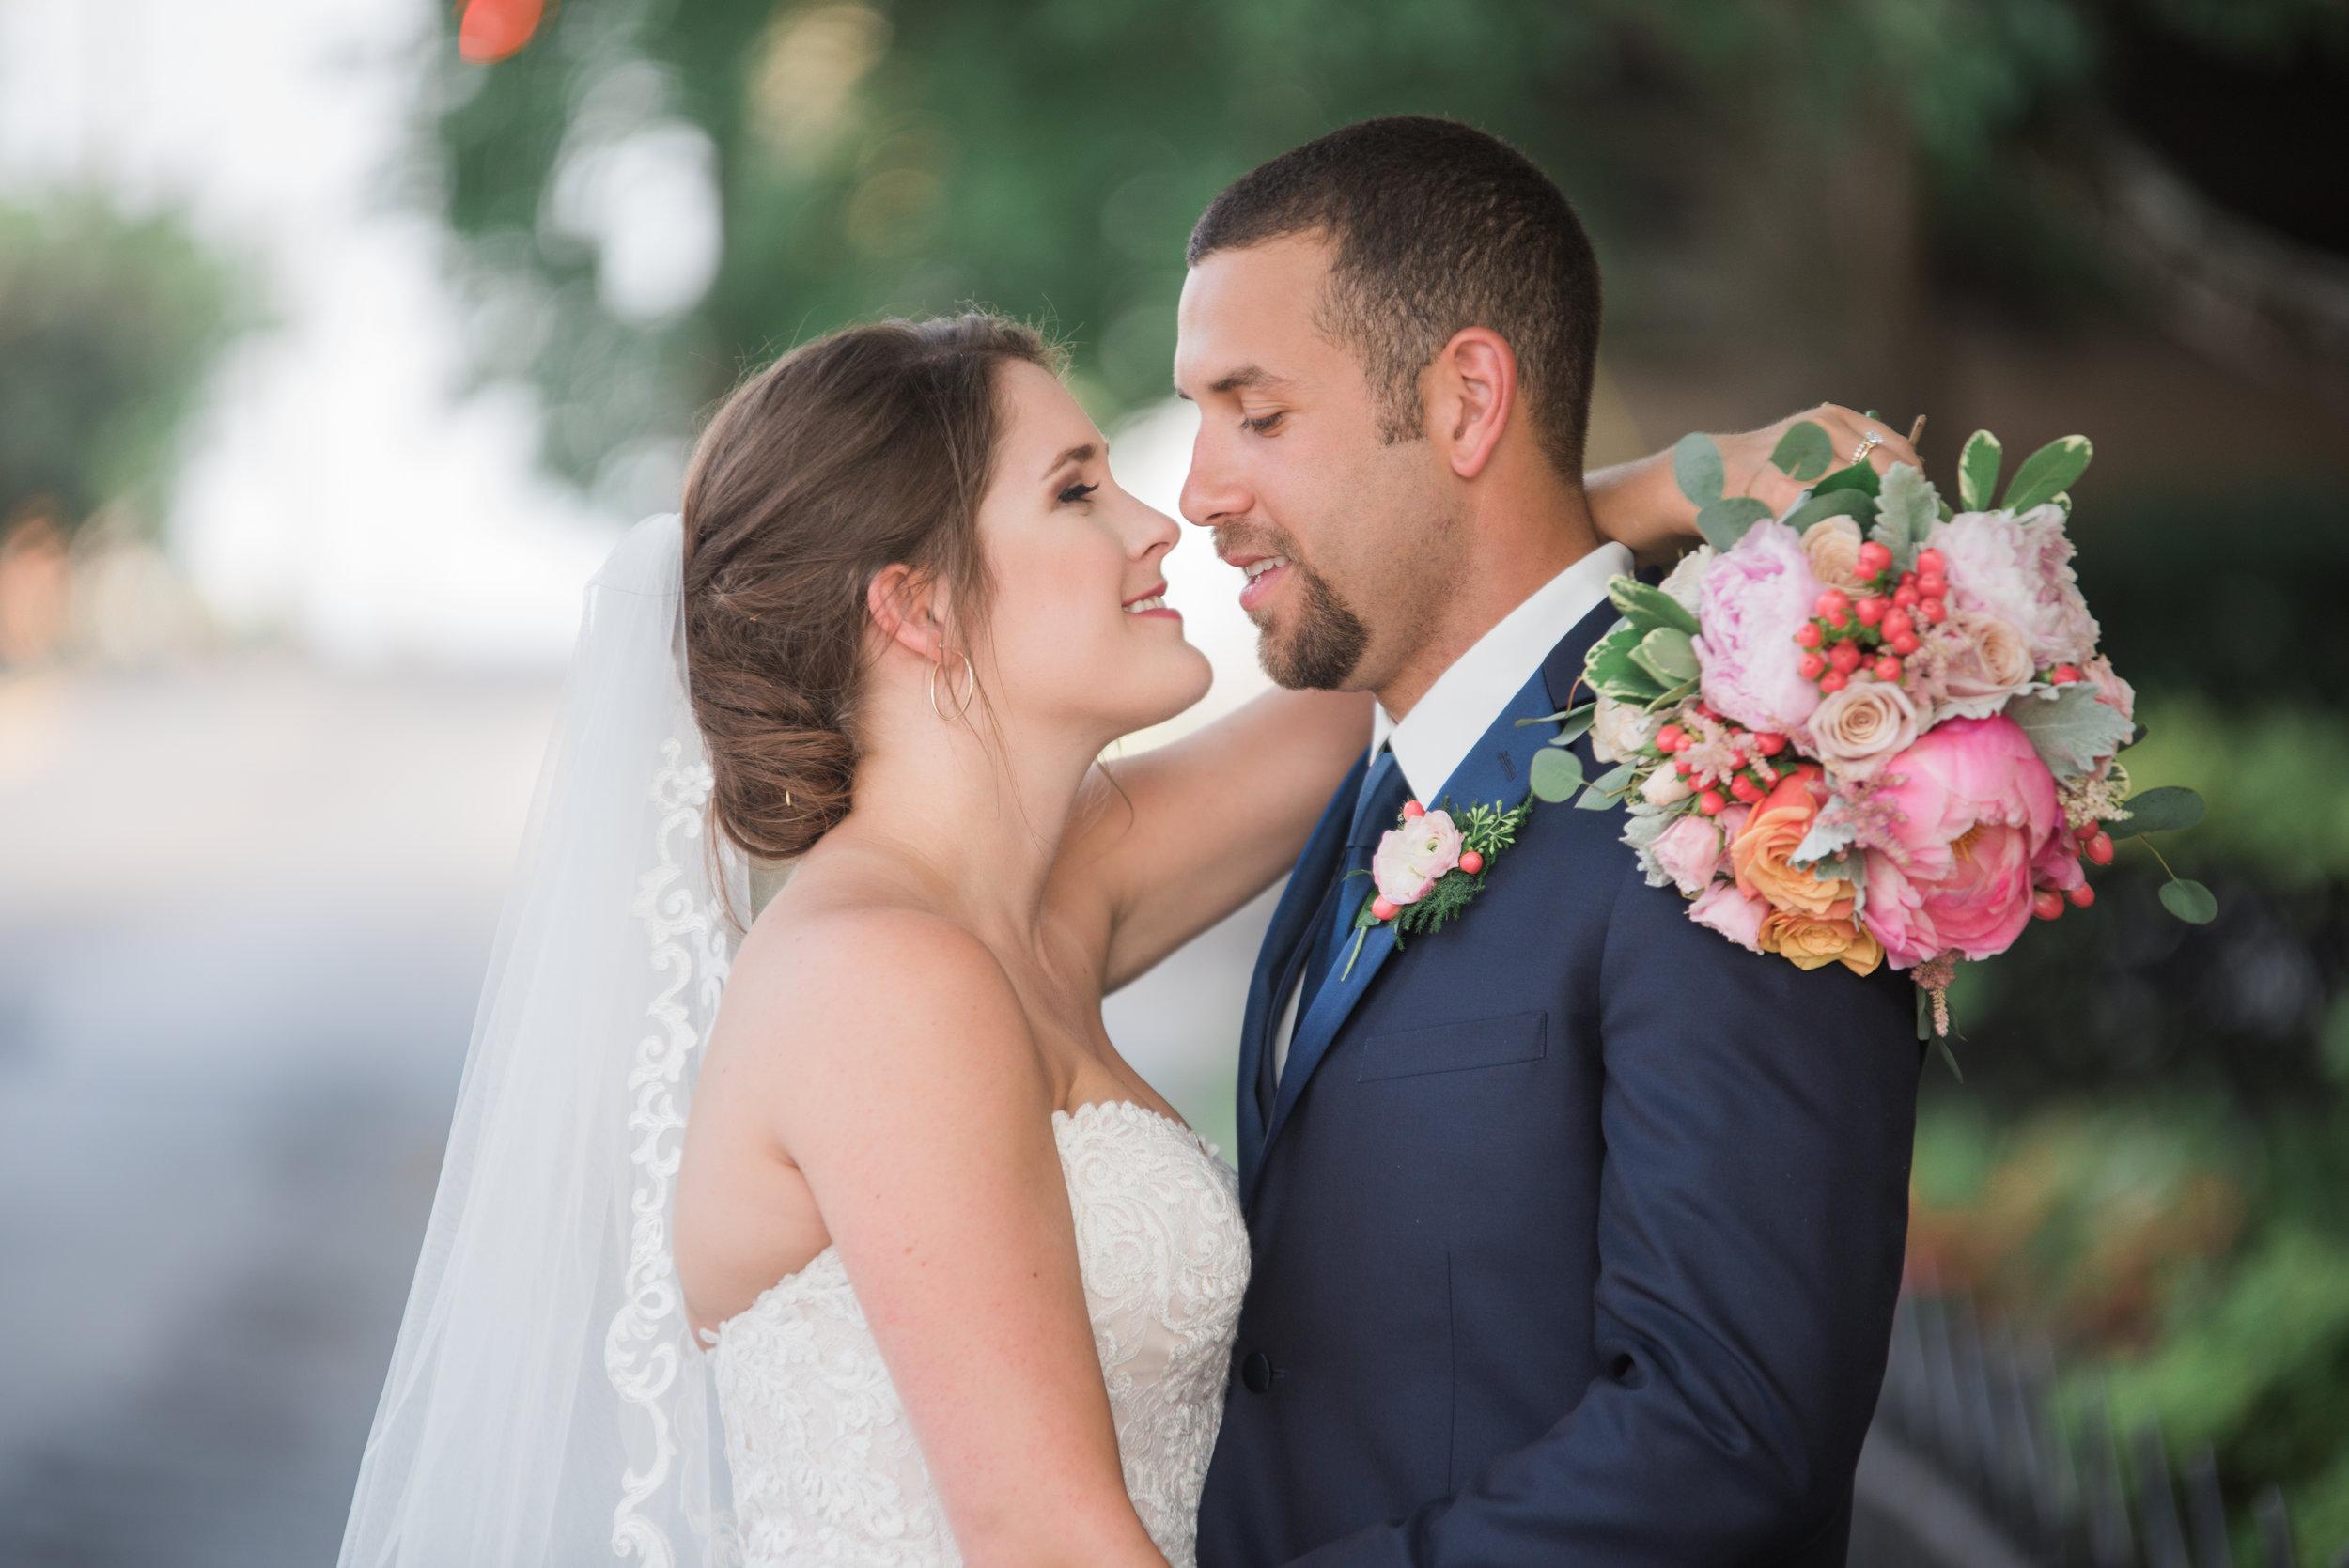 Rome Wedding 1st edits (28 of 36).jpg